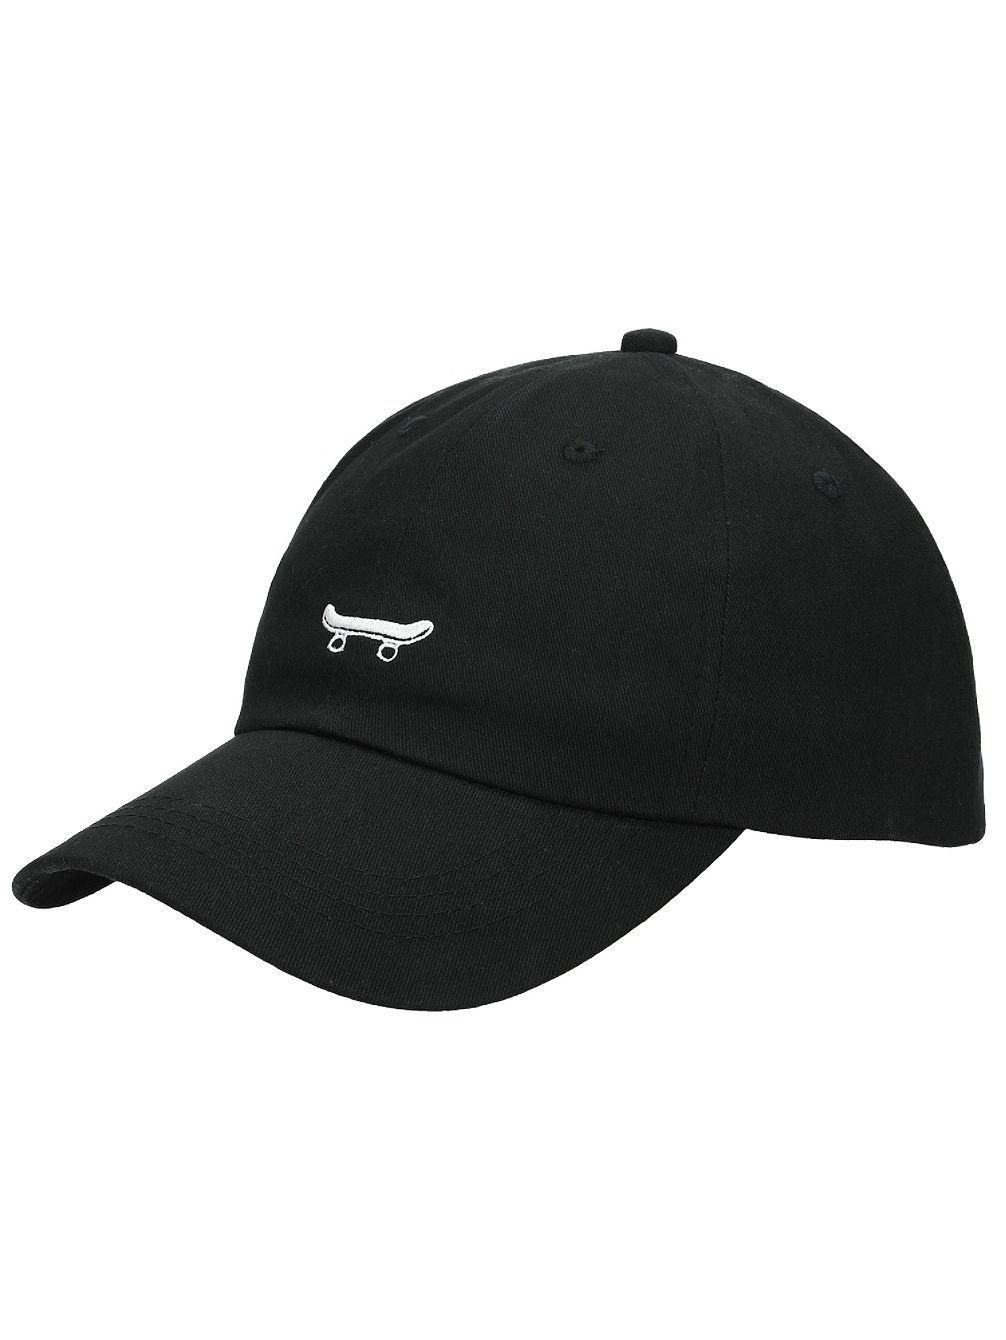 Buy Blue Tomato Skate Dad Hat Cap online at blue-tomato.com ca4871c46a4